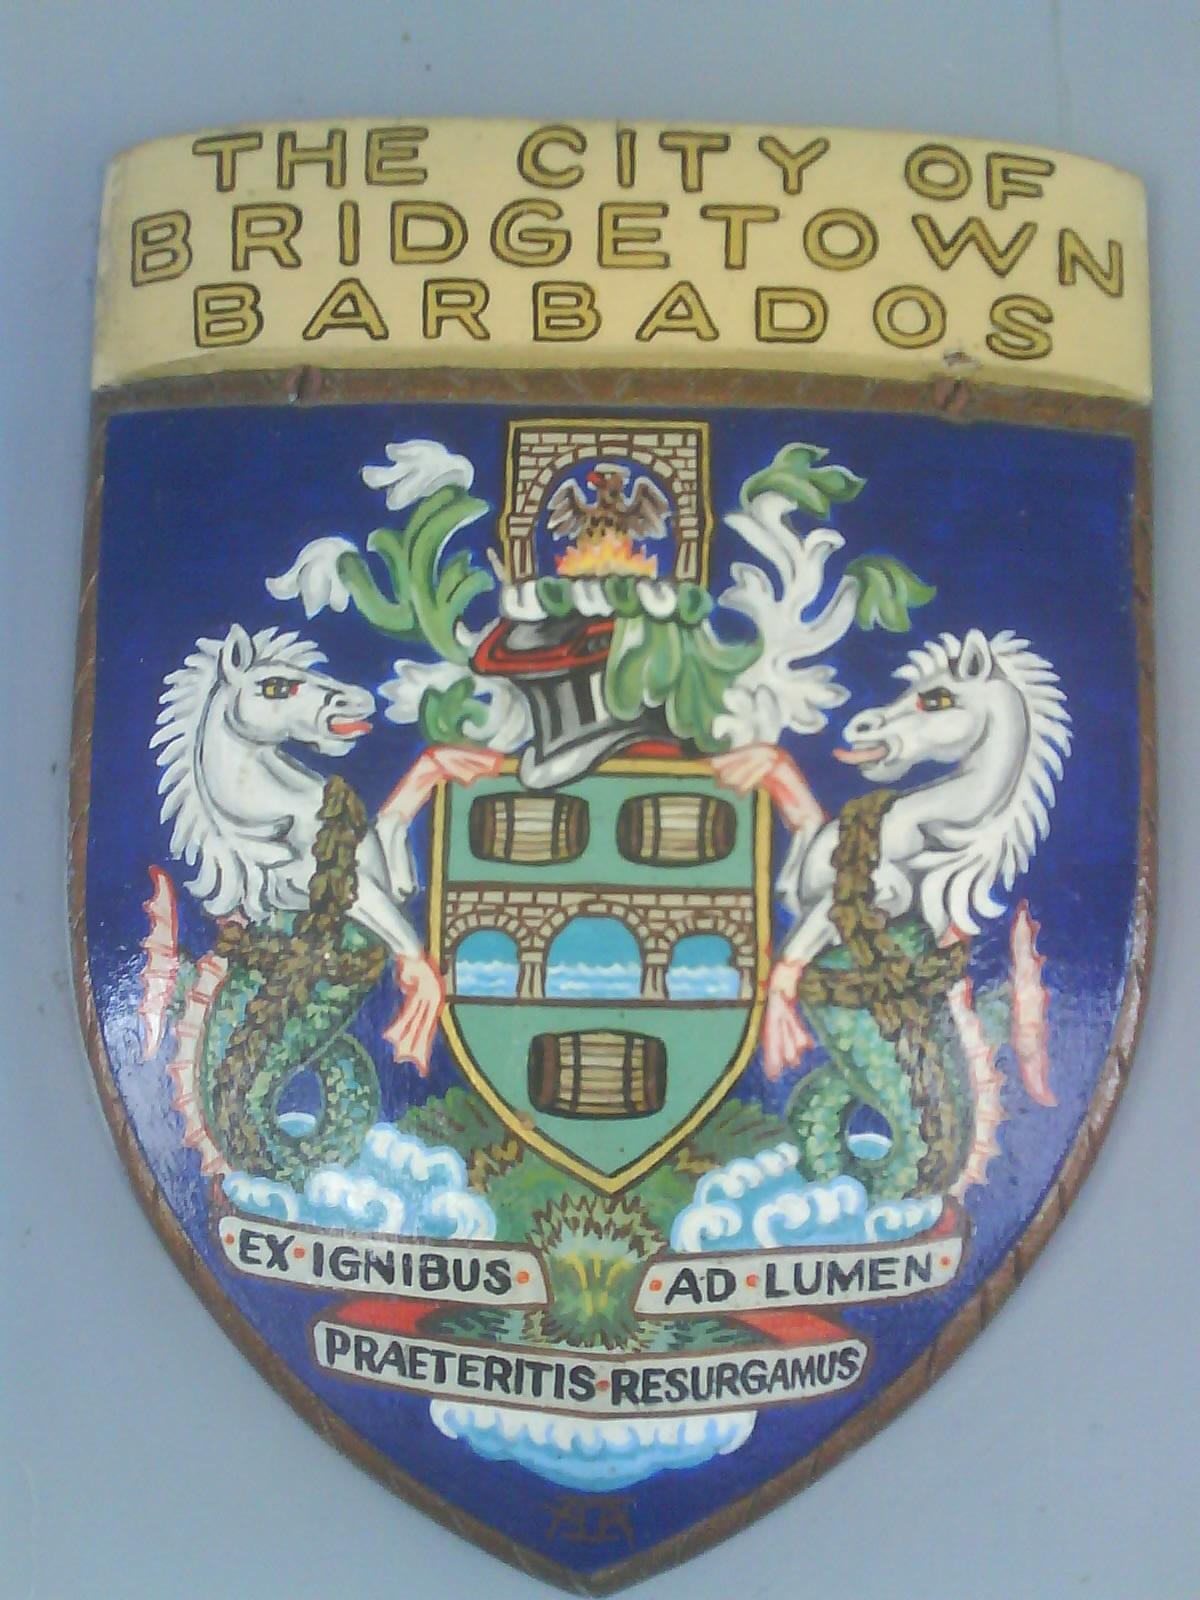 Depiction of Bridgetown